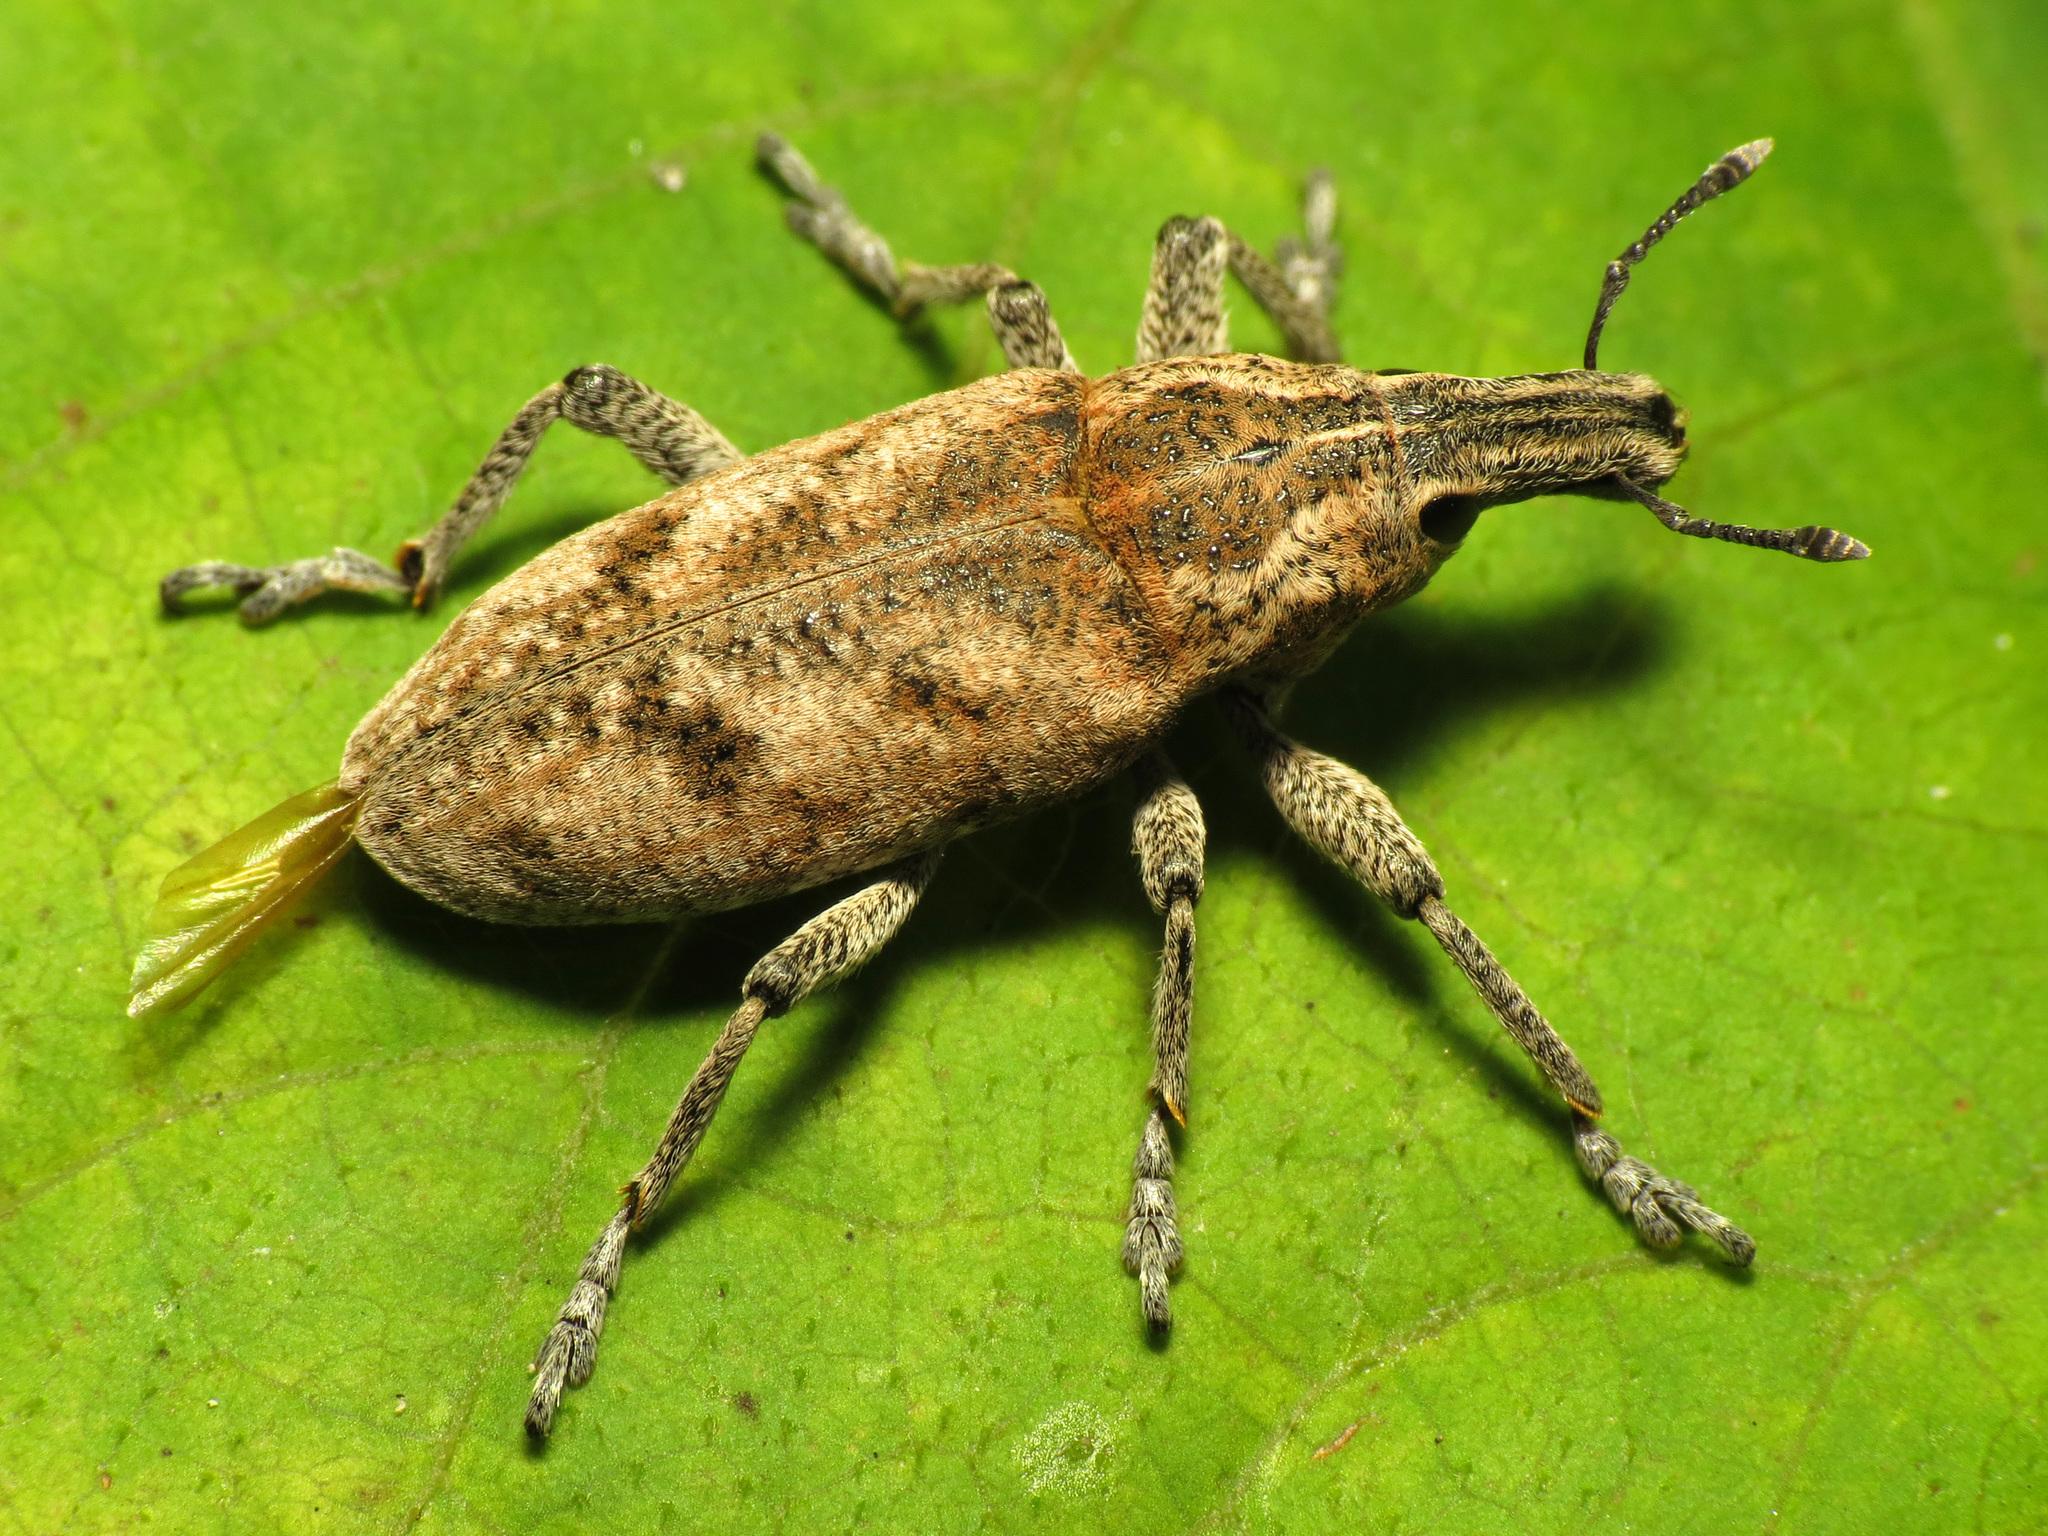 Image of Sluggish weevil